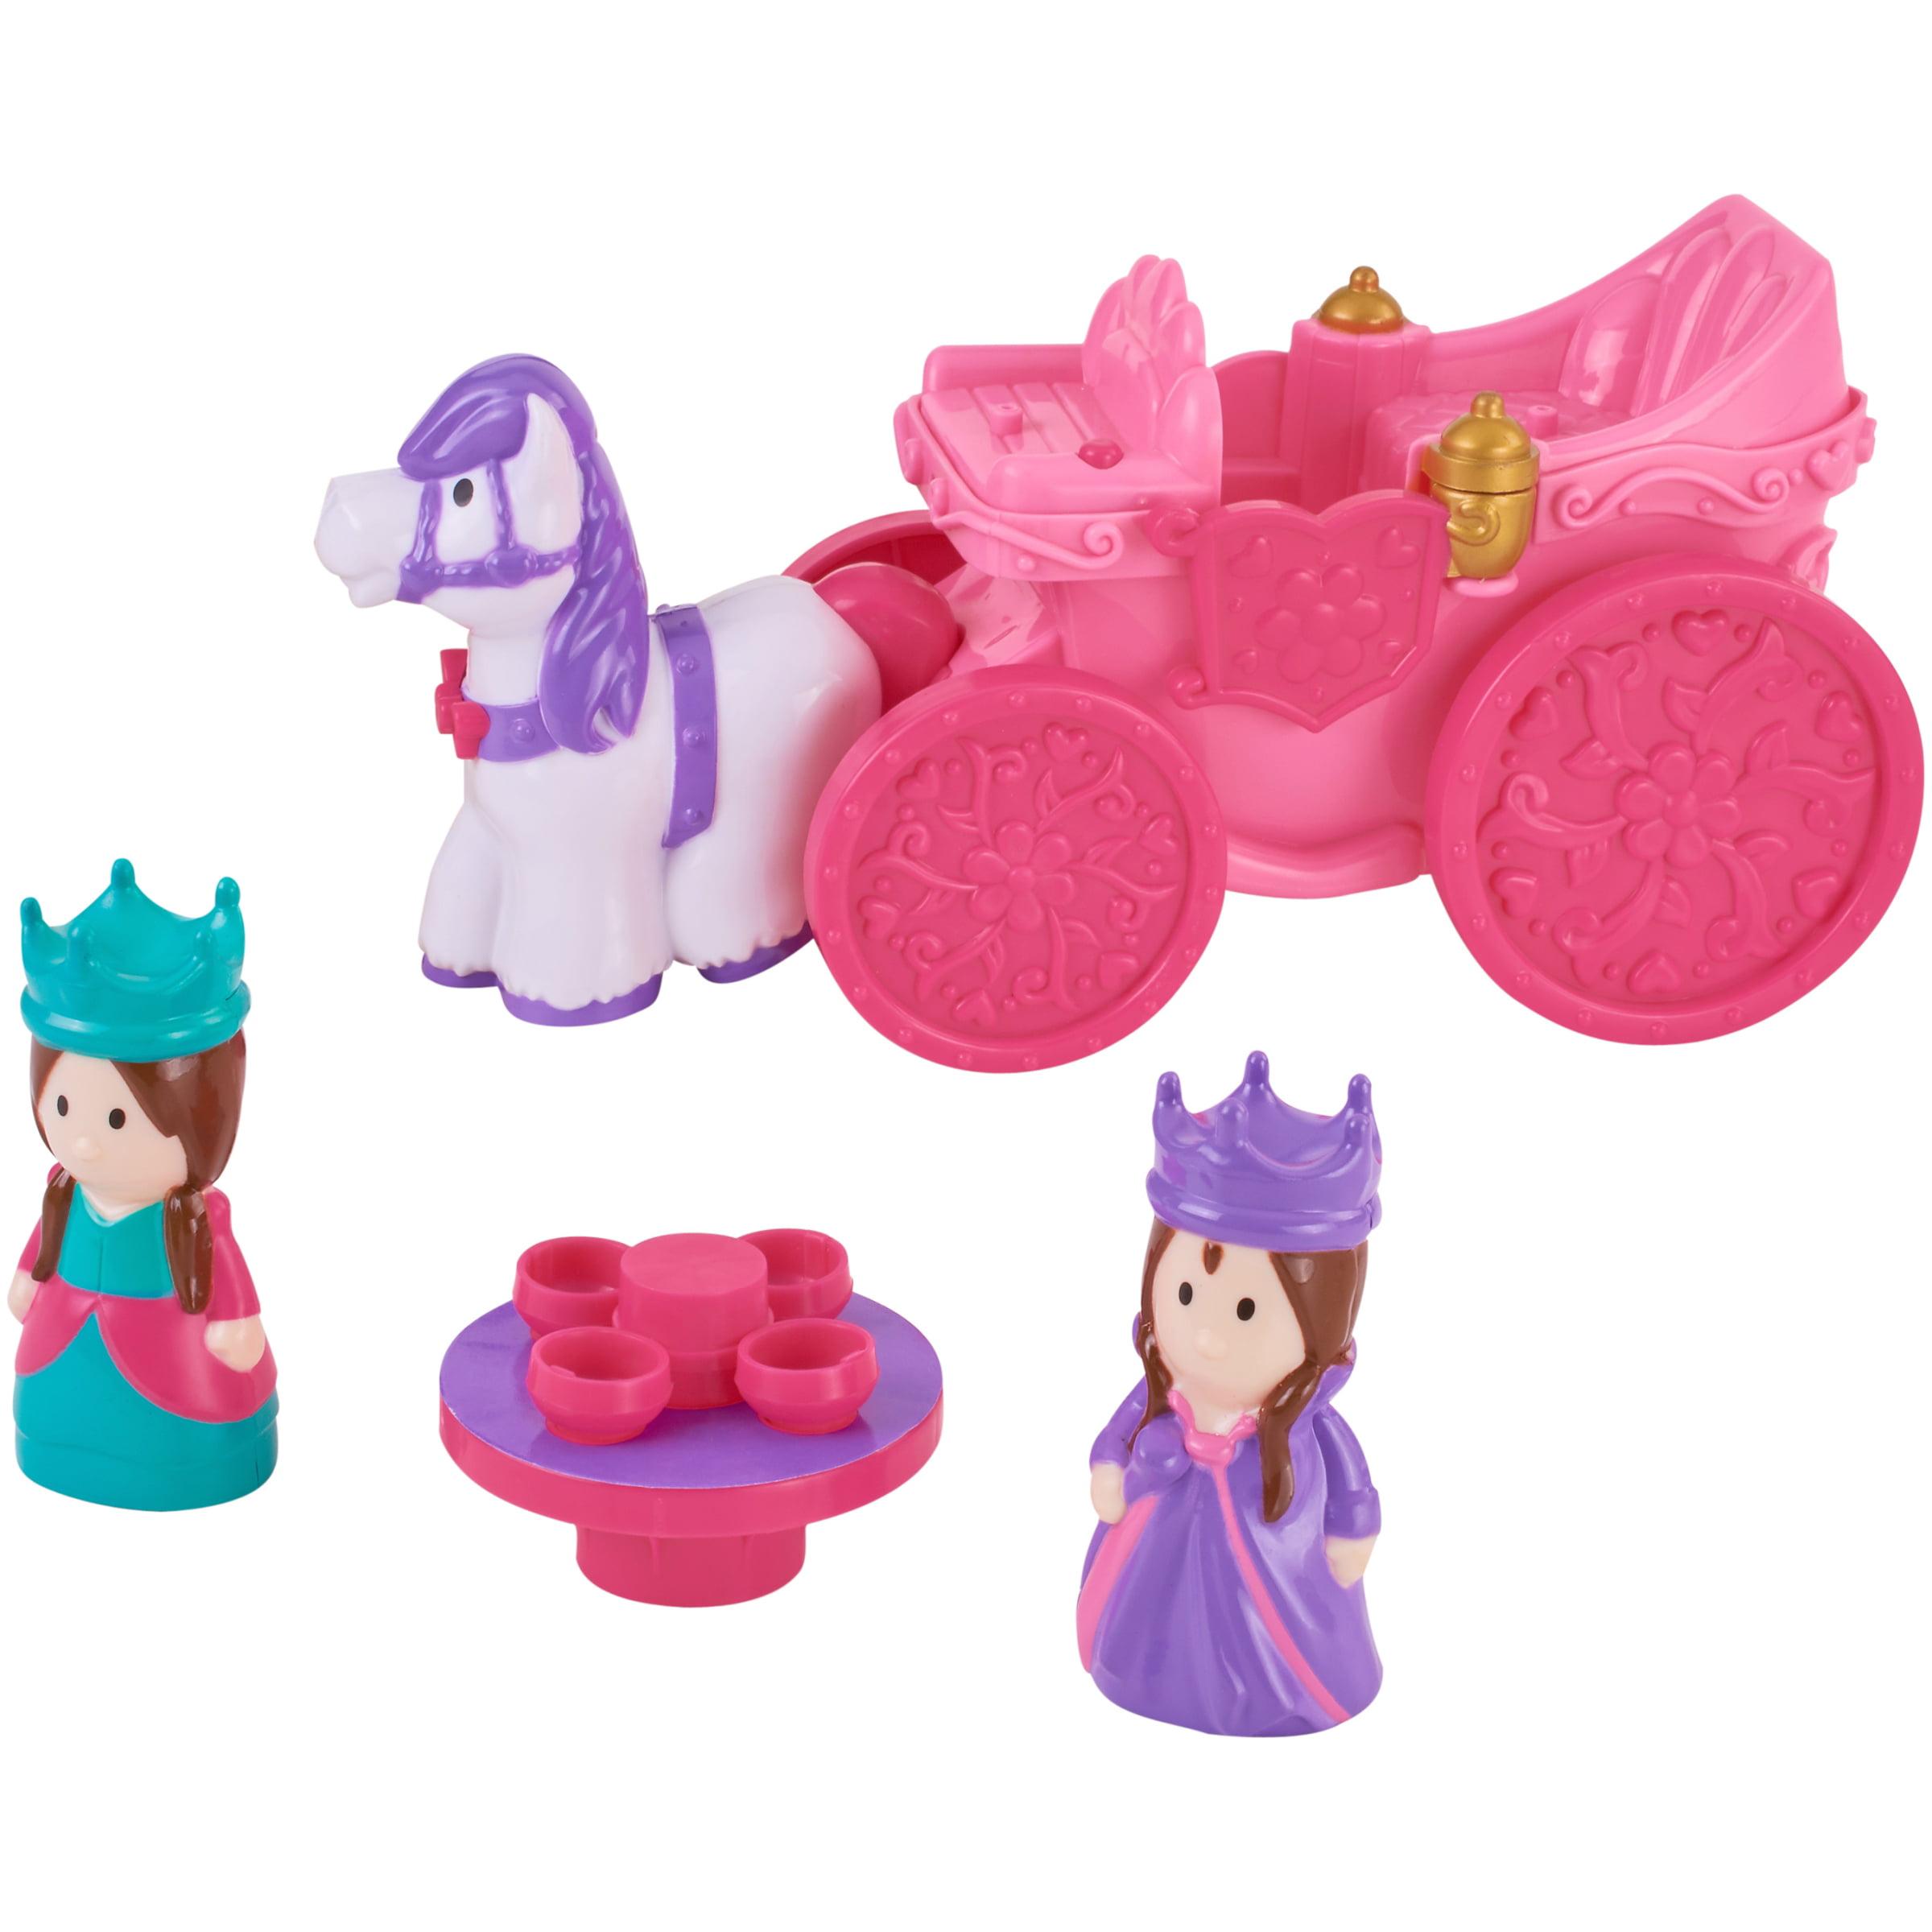 Kid Connection 4-Piece Light & Sound Princess Carriage Play Set